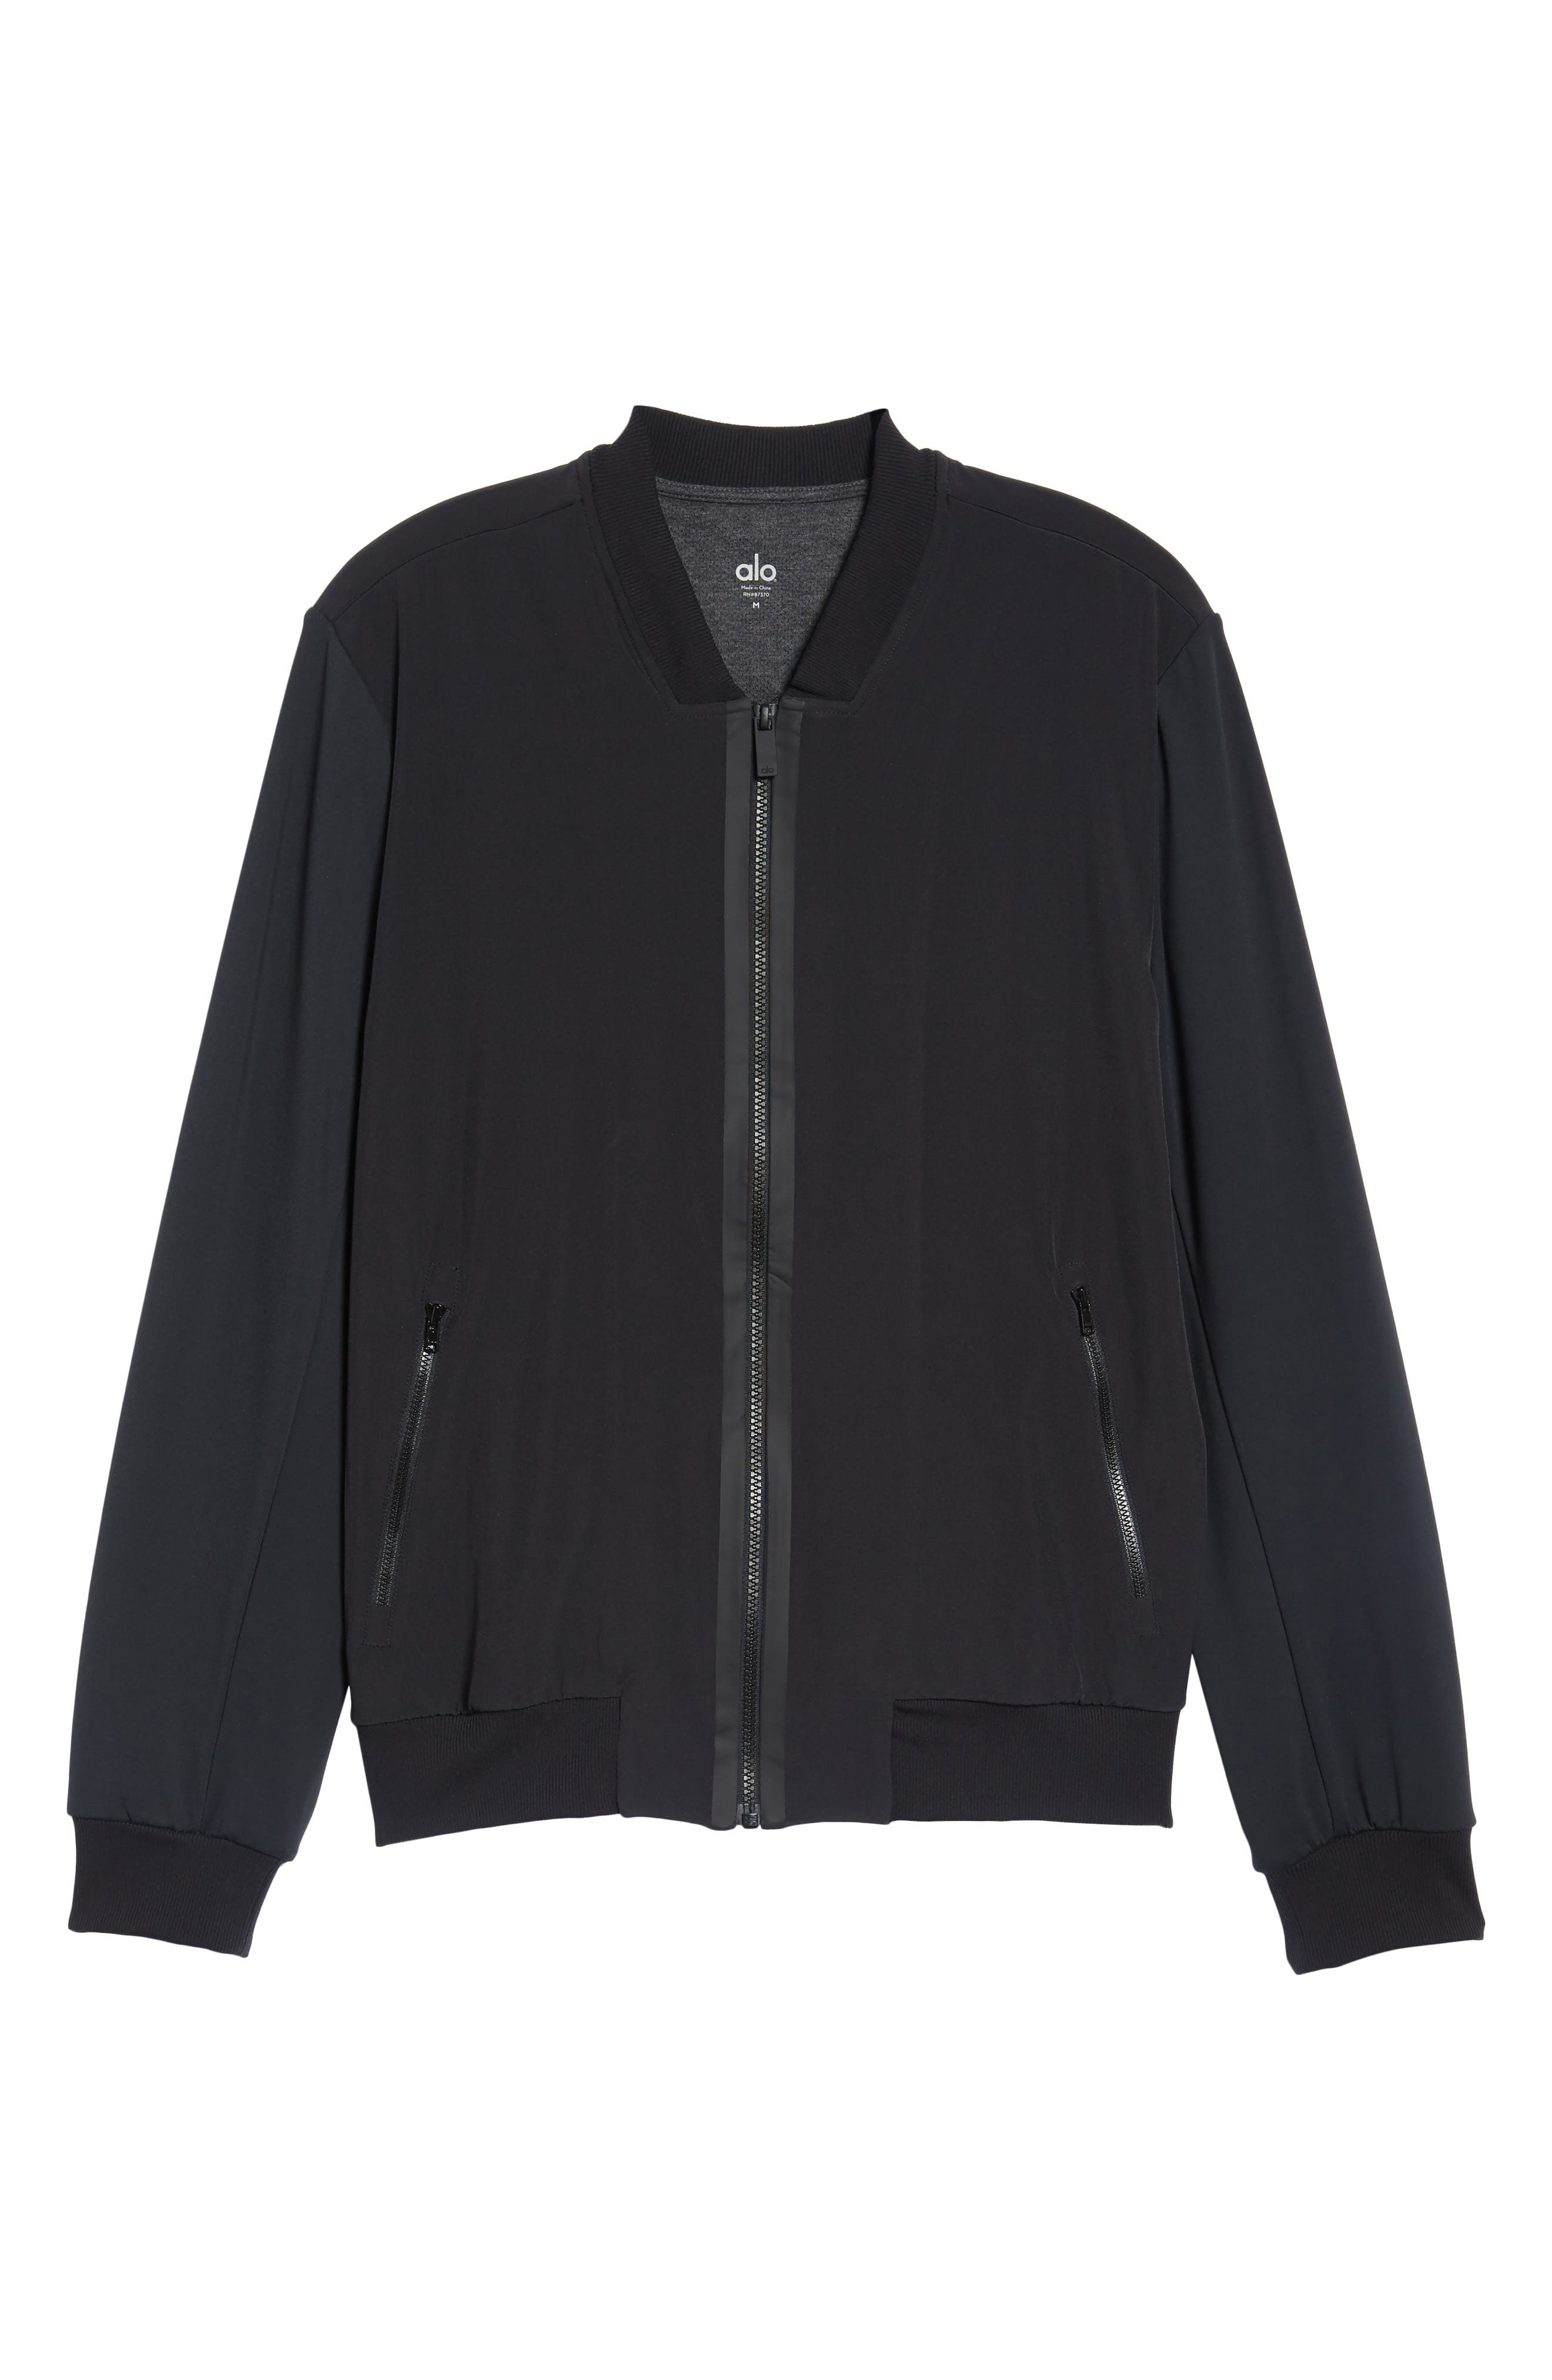 Inversion Relaxed Bomber Jacket,                             Alternate thumbnail 6, color,                             Black